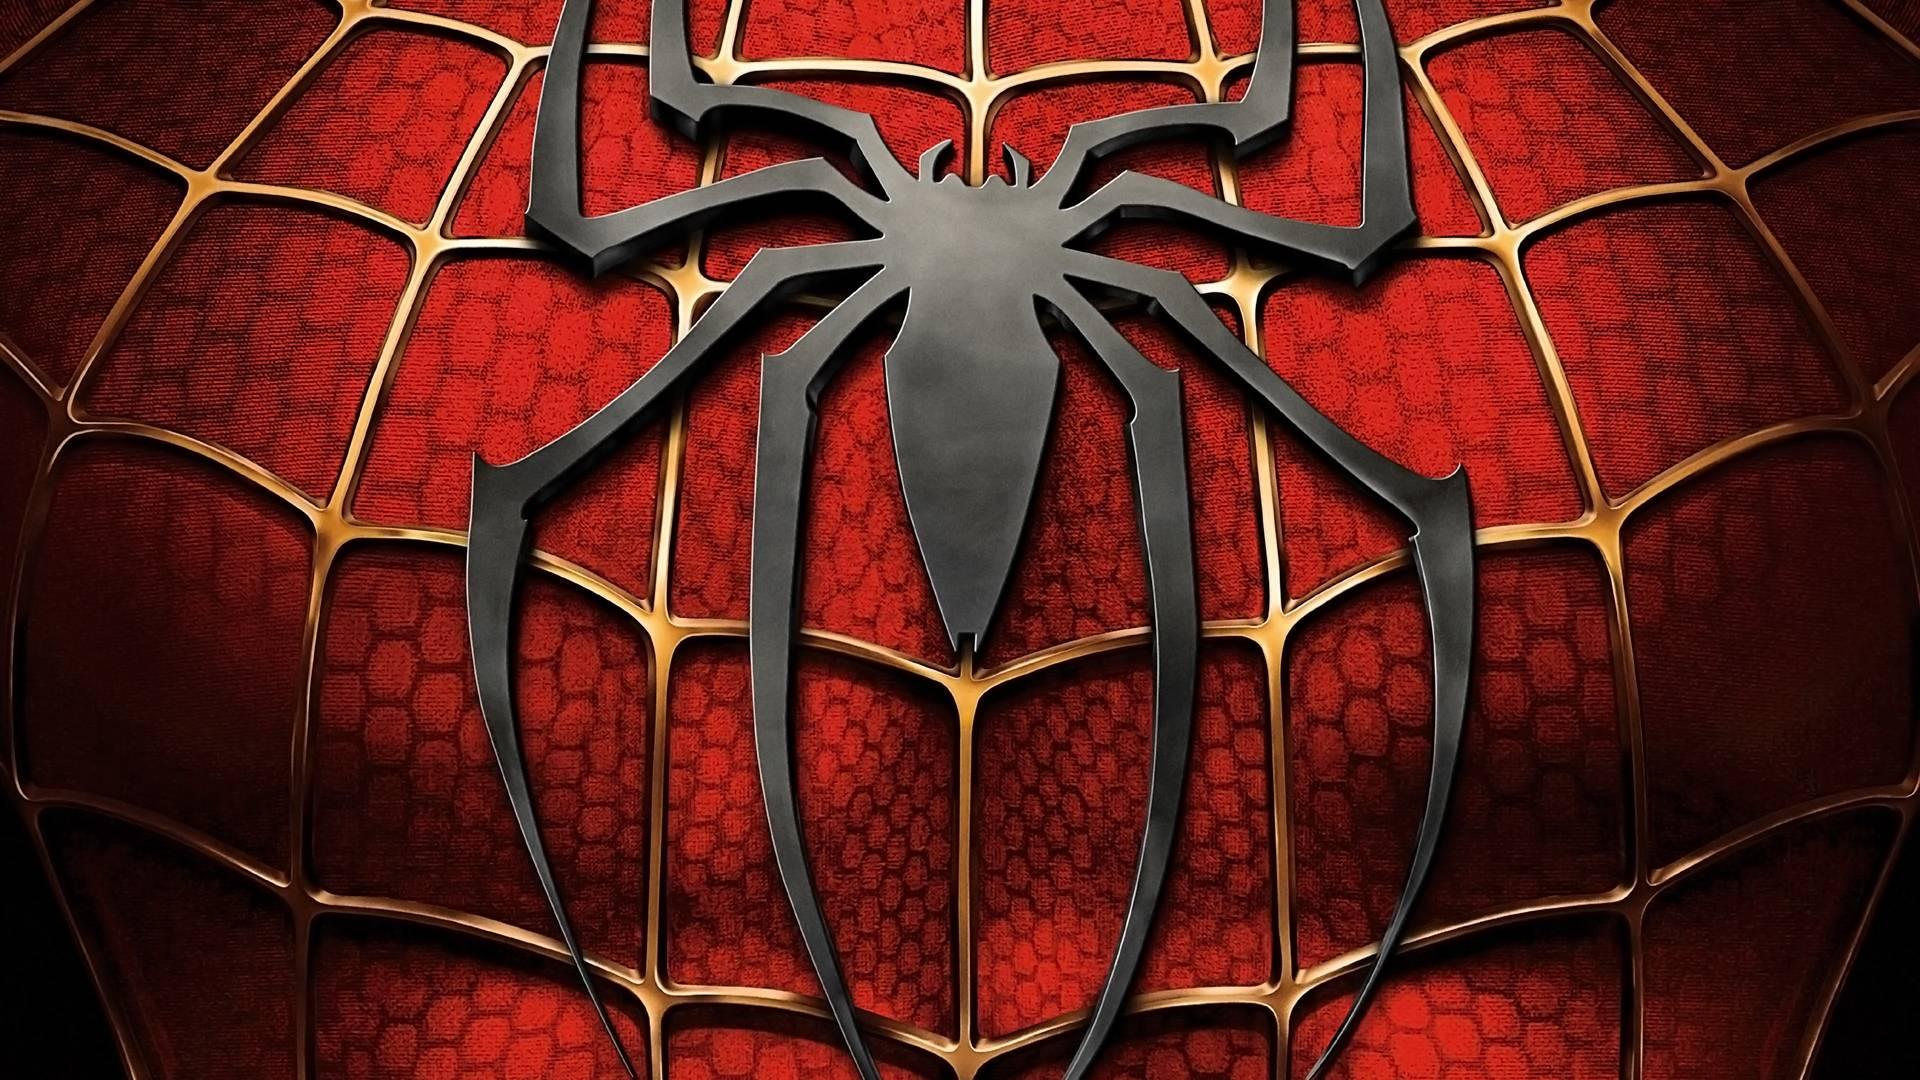 Hd wallpaper spiderman - Spiderman Chest Wallpaper